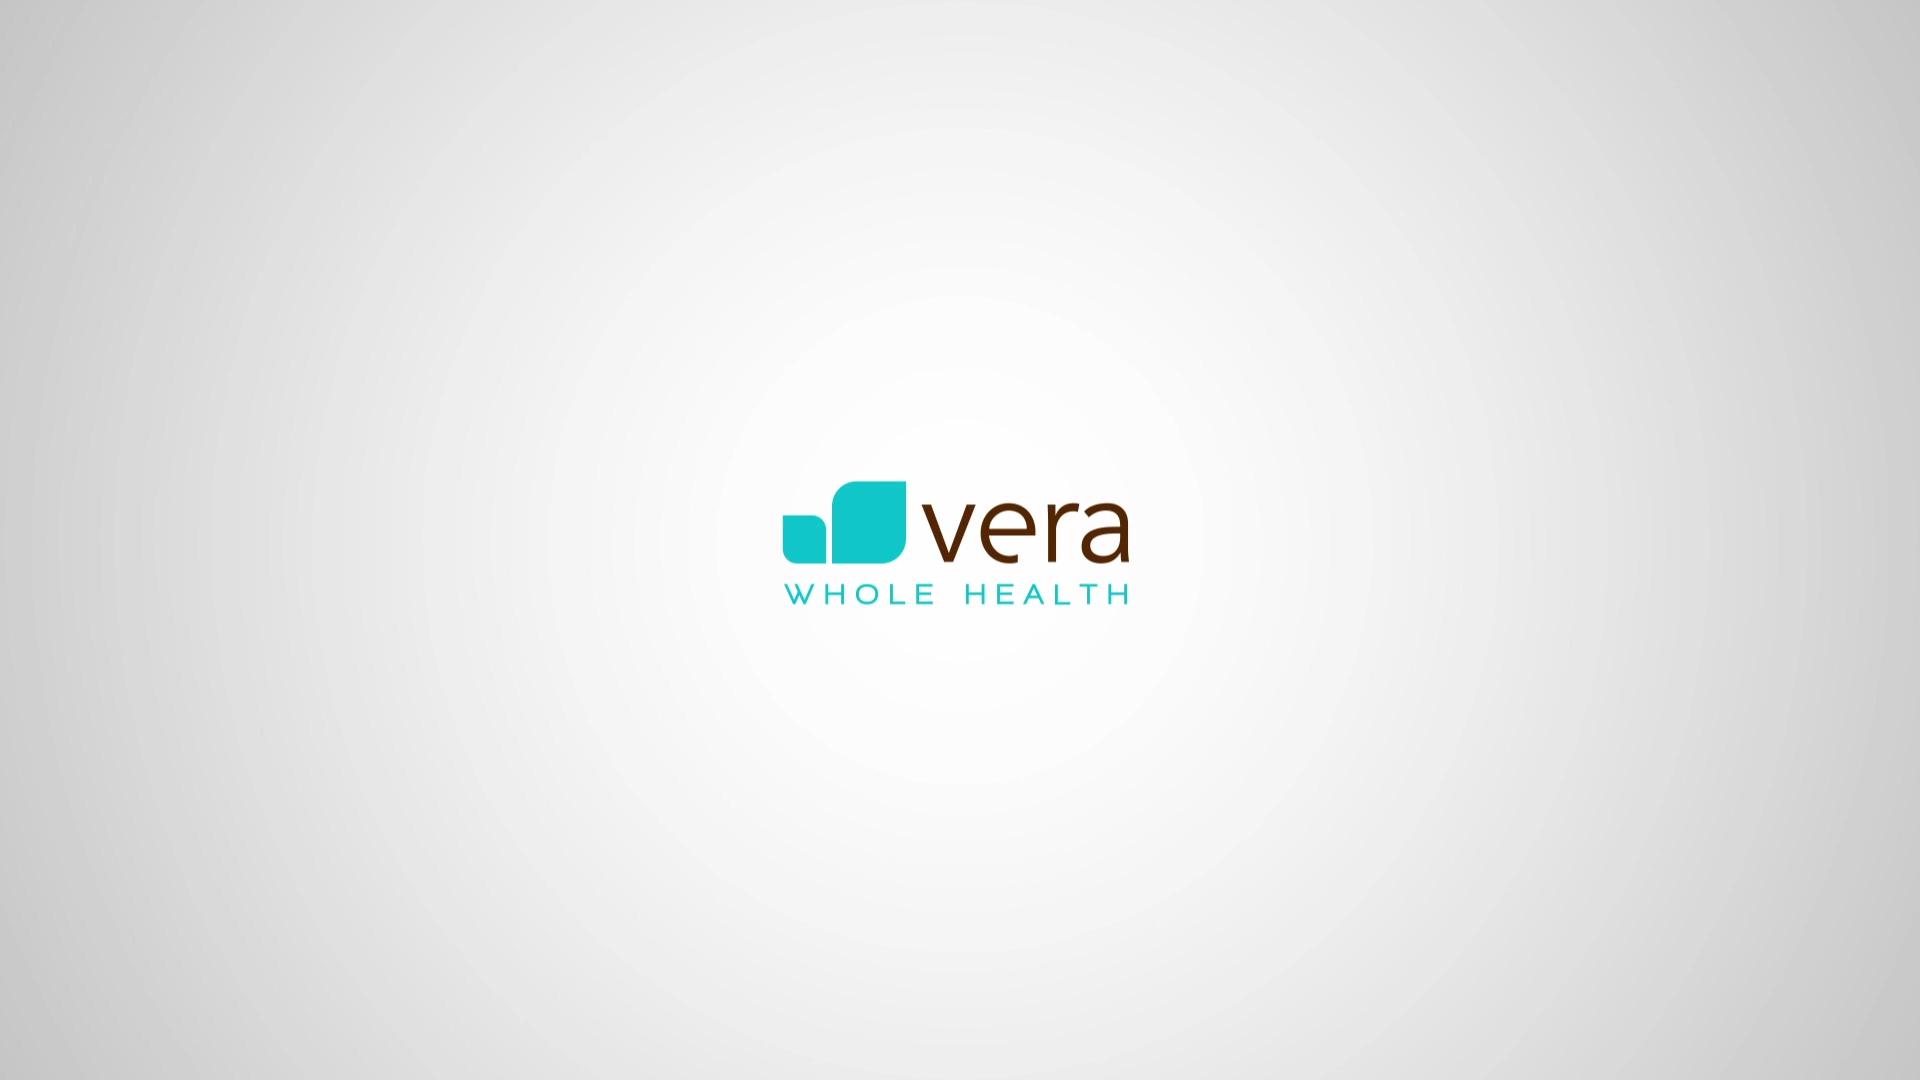 20.02.04_Healthcare-Providers-Innovative-Solutions_blog-video_ryan-s_vera